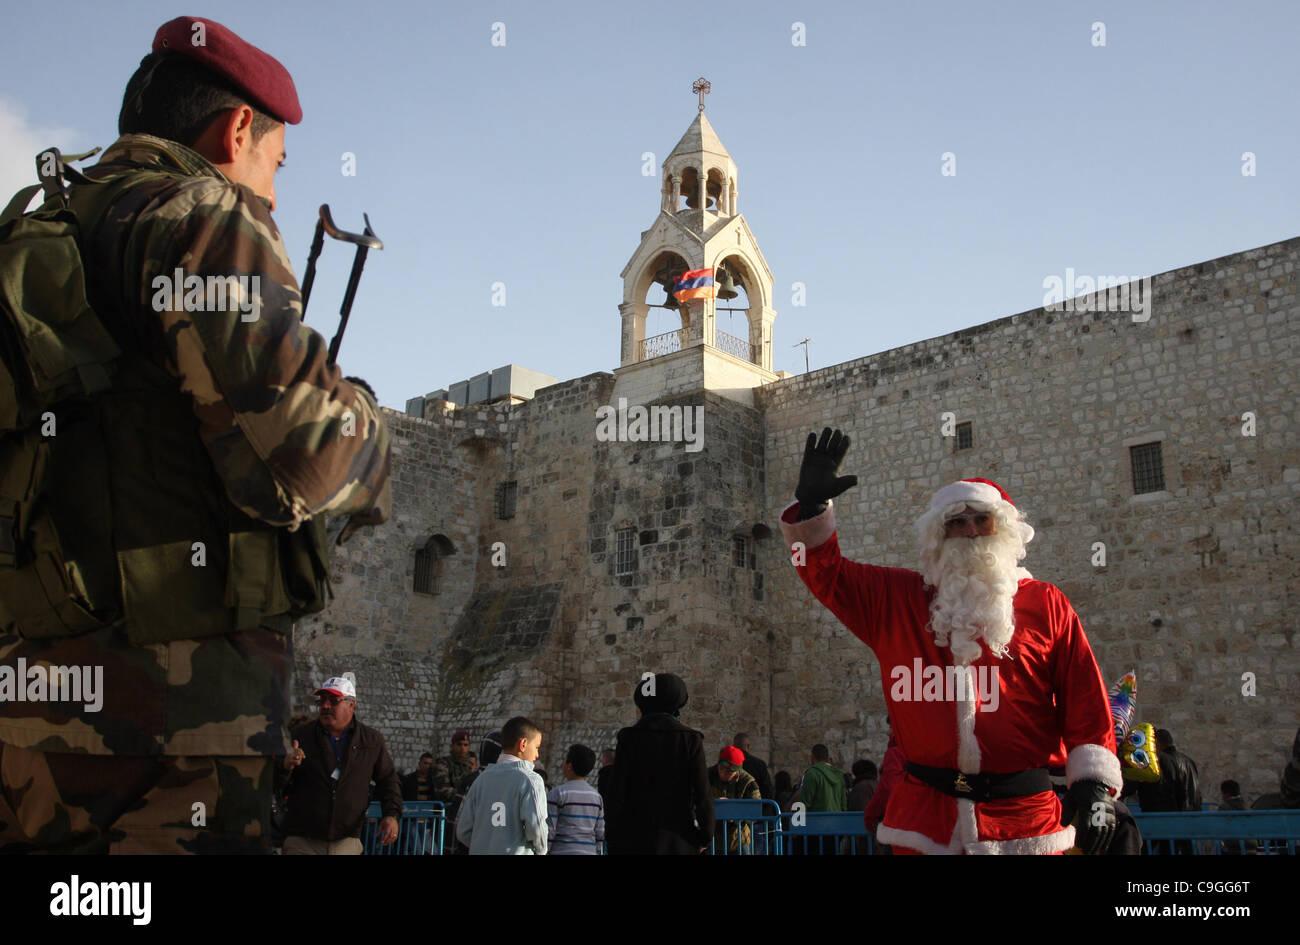 Bethlehem Christmas Dec 25 2020 Dec. 25, 2011   Bethlehem, West Bank, Palestinian Territory Stock